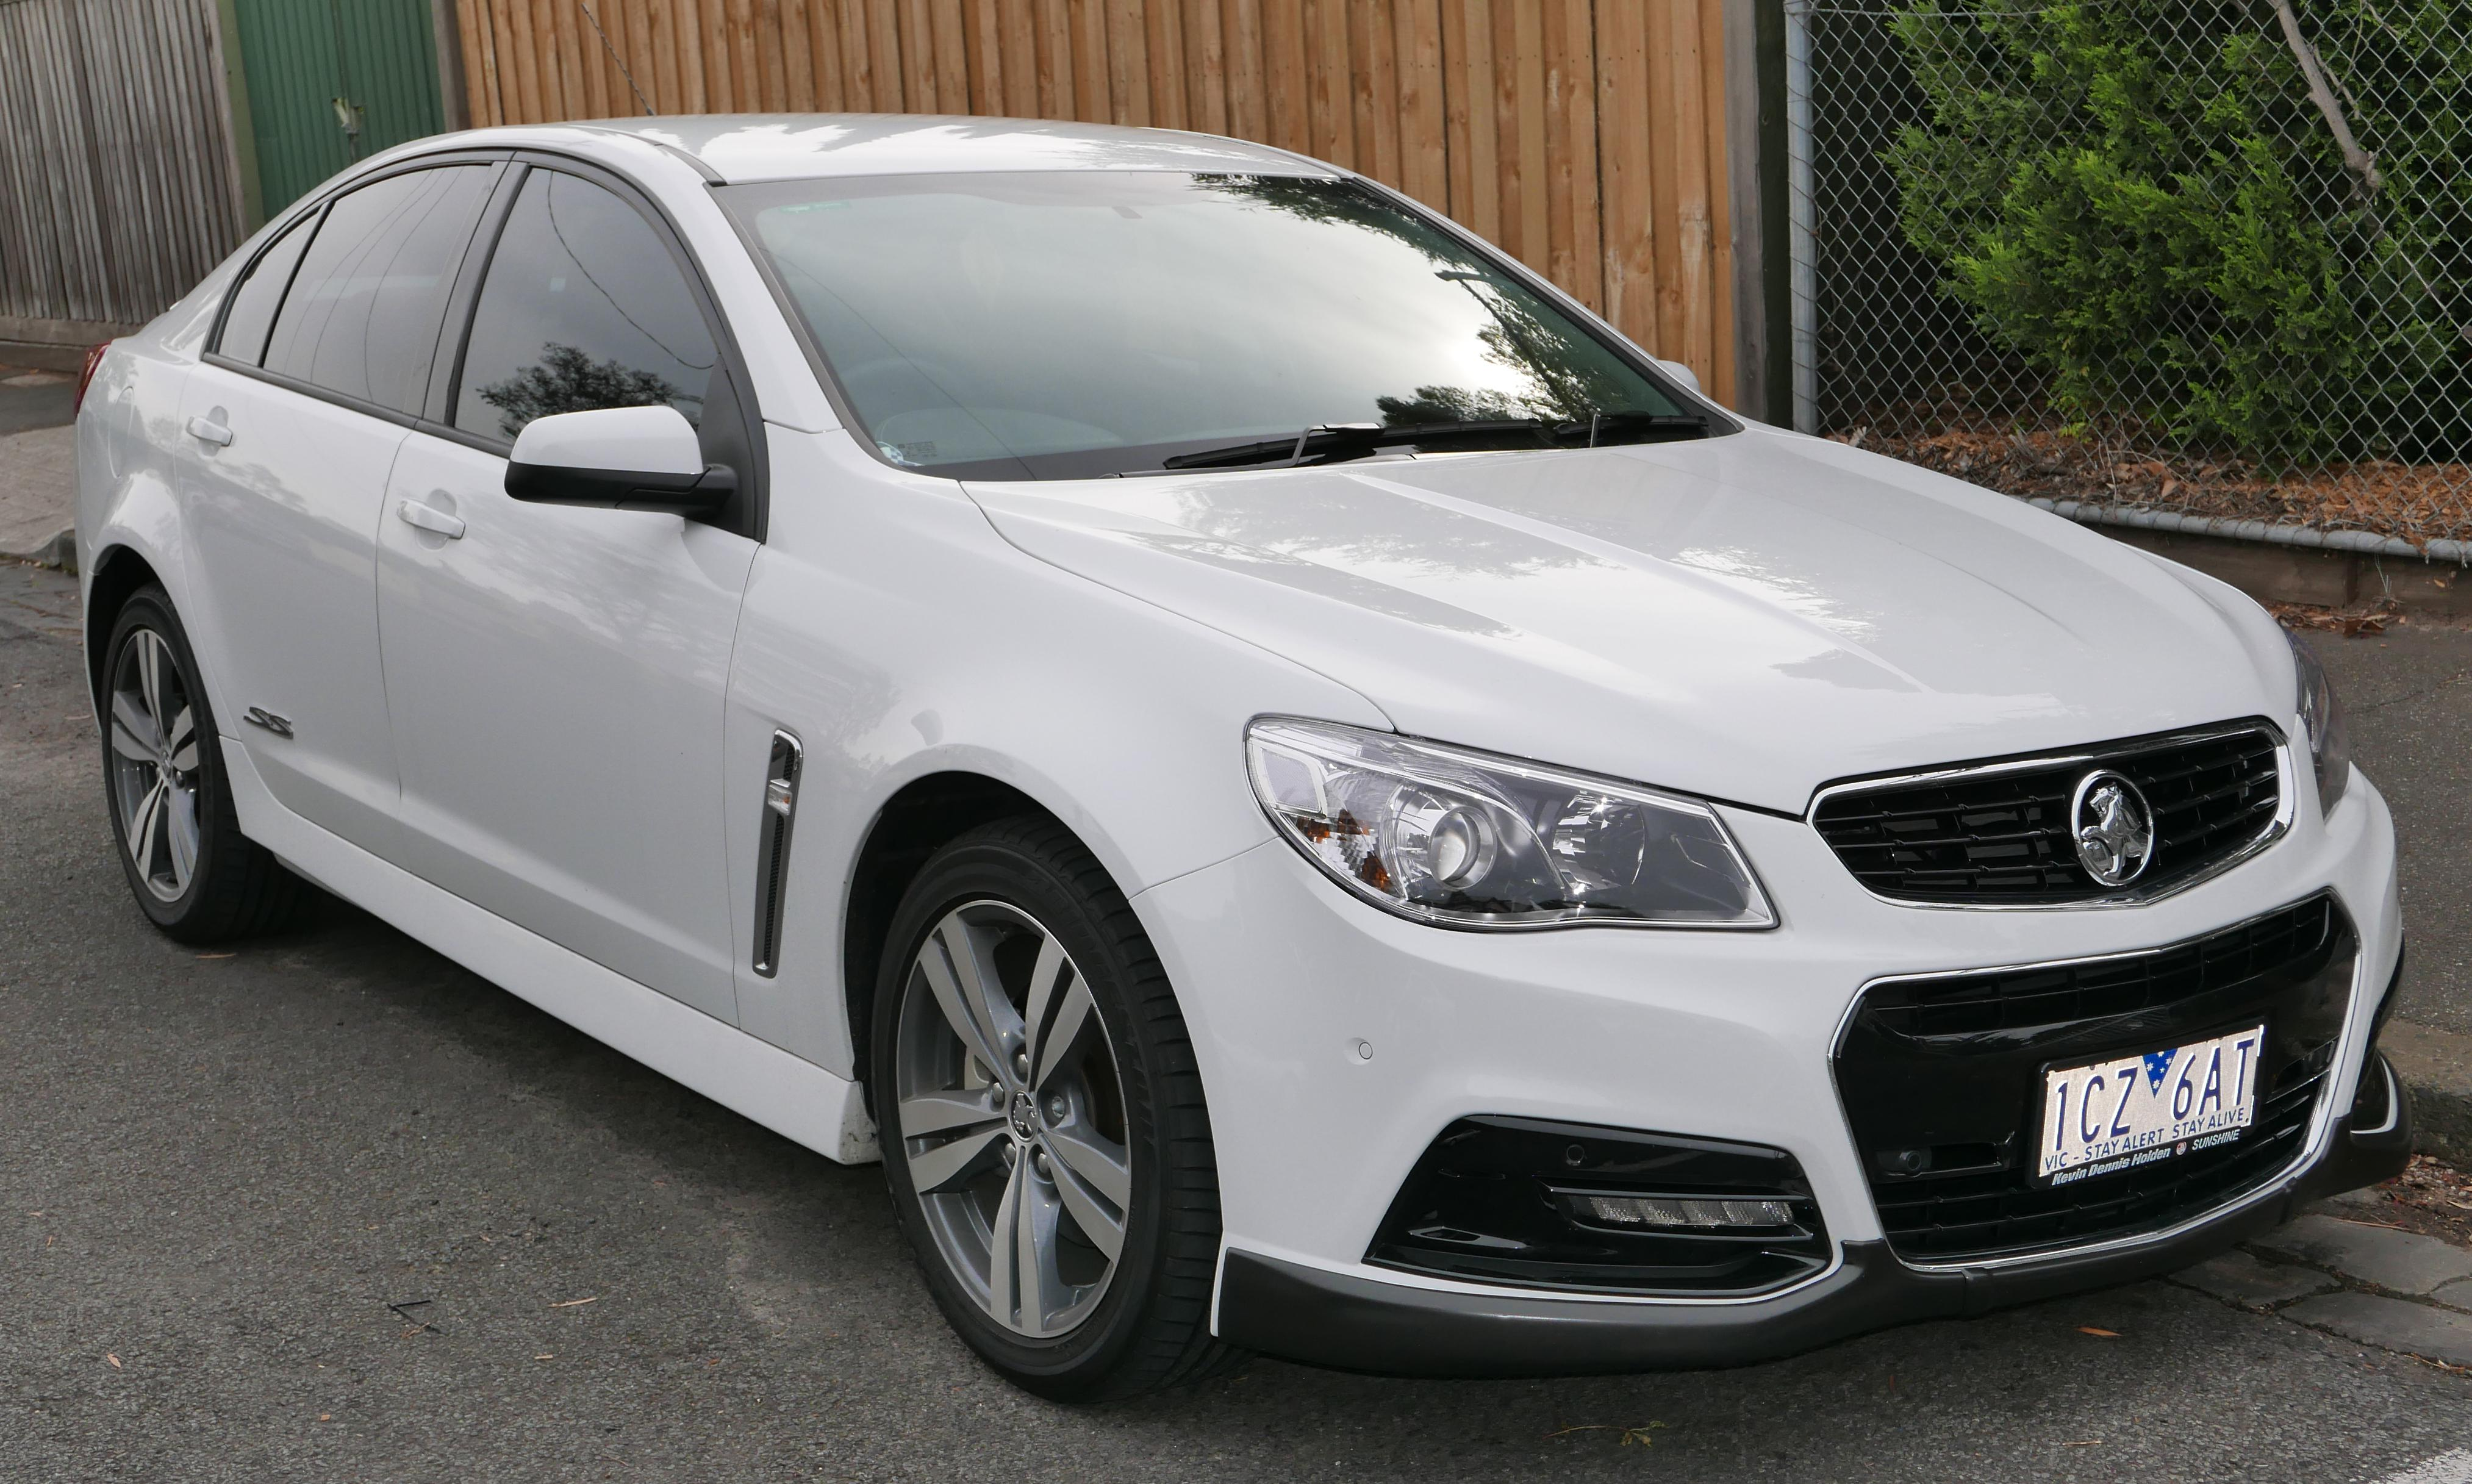 Flipboard Holden Brand To Disappear In Australia 600 Jobs Gone